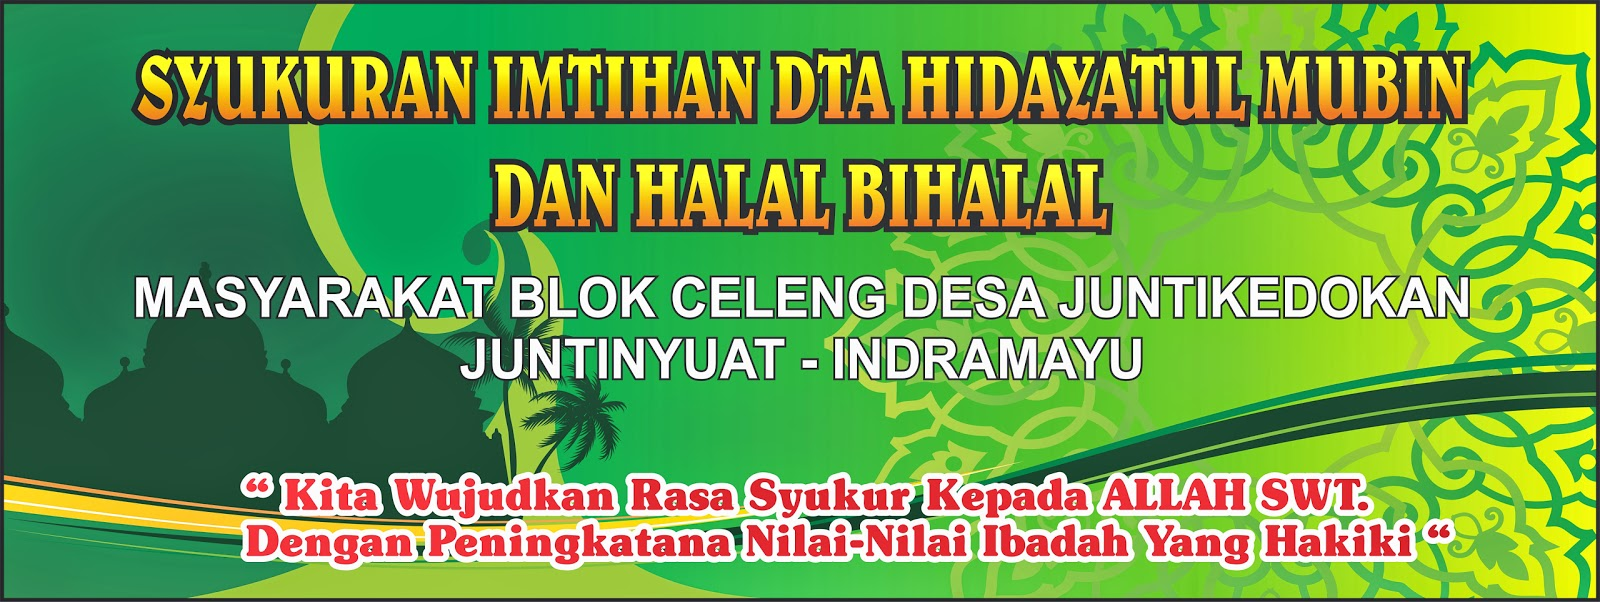 Banner Halal Bi Halal Cdr Joy Studio Design Gallery